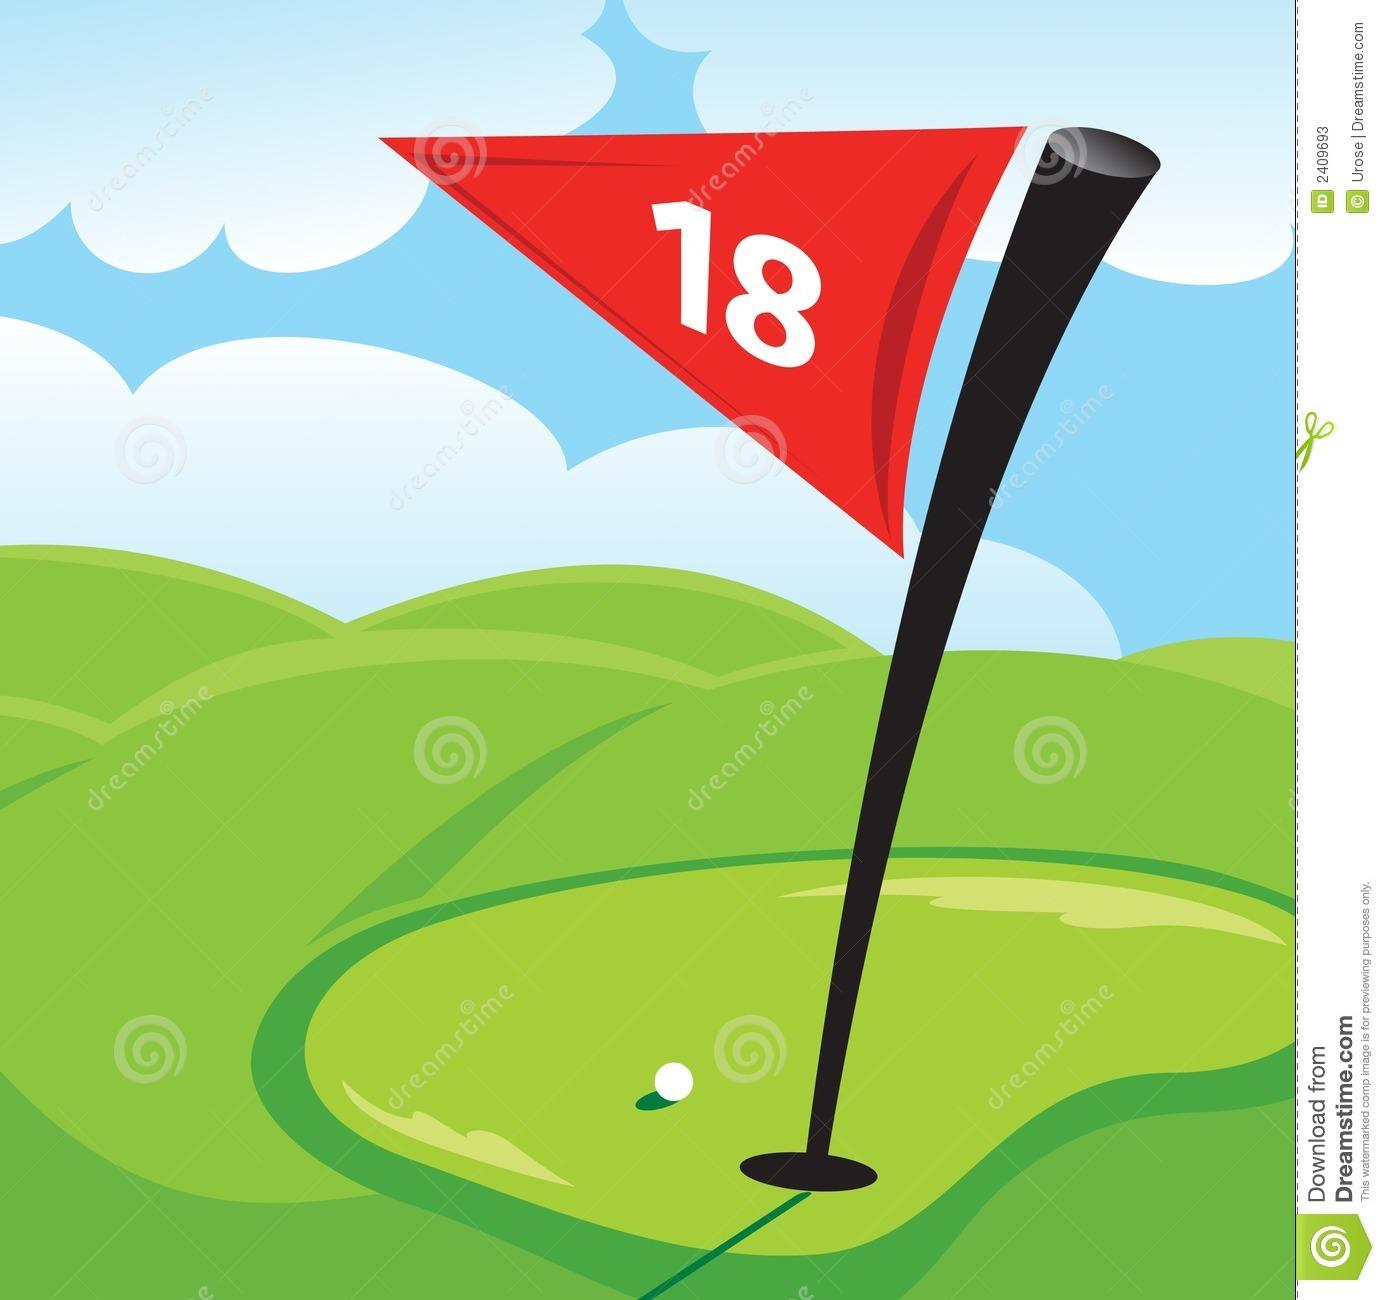 Golf hole clip art.